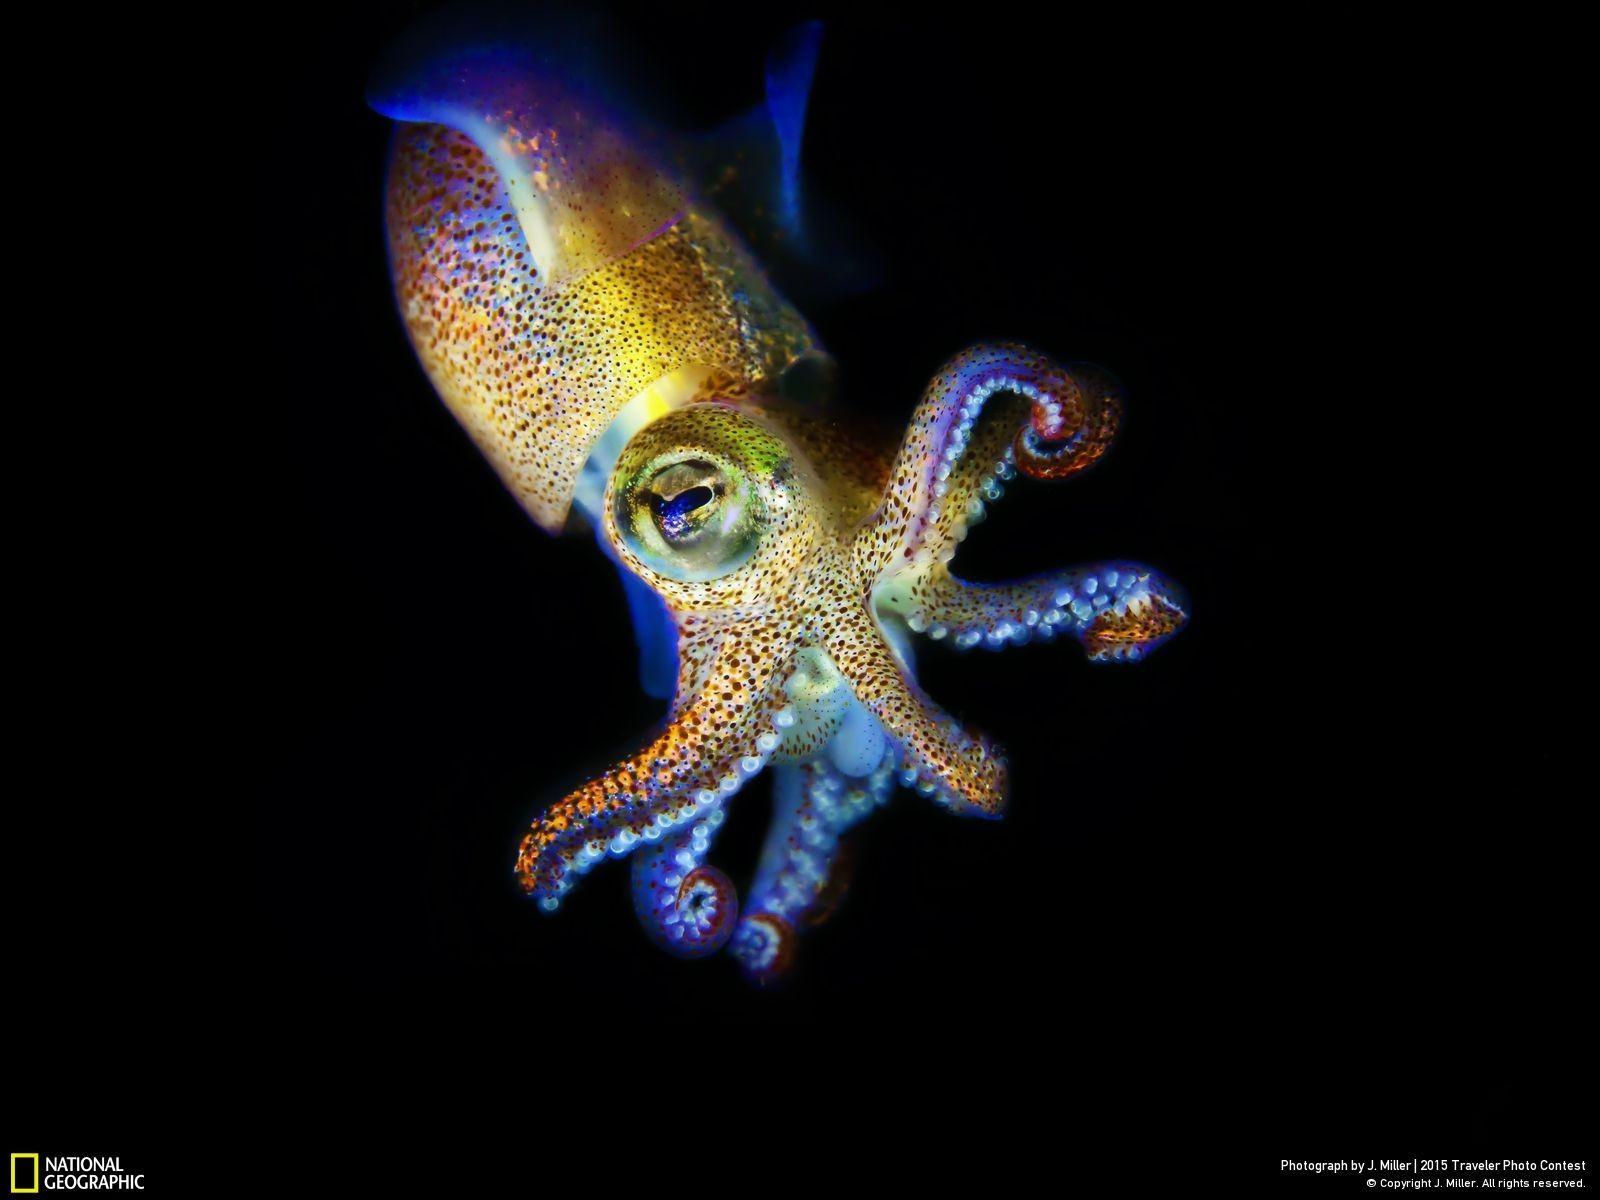 Wallpaper Wildlife Octopus Starfish Invertebrate